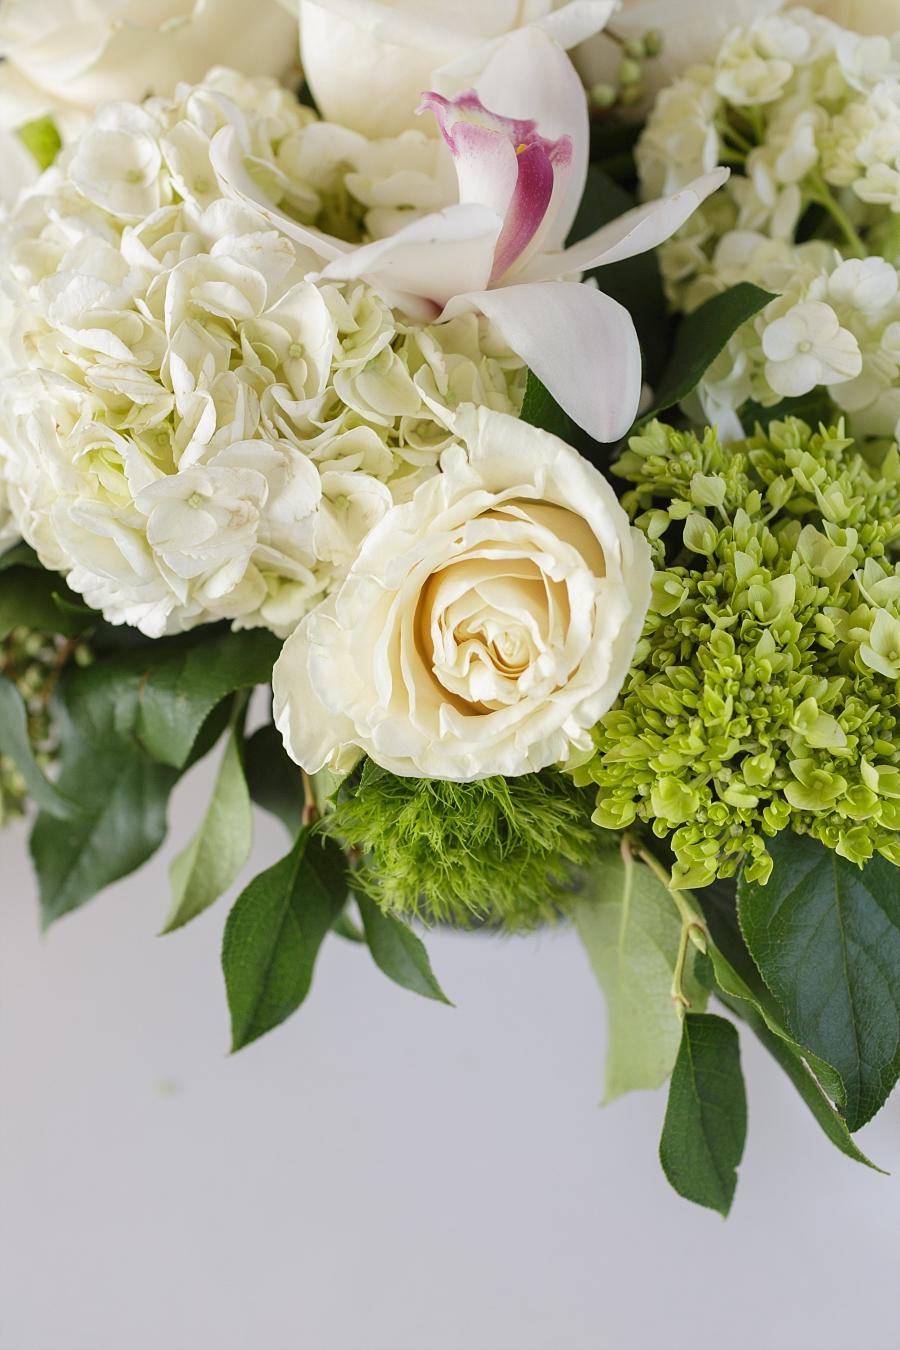 Stacy-Anderson-Photography-McGovern-Centennial-Gardens-Houston-Wedding-Photographer_0035.jpg